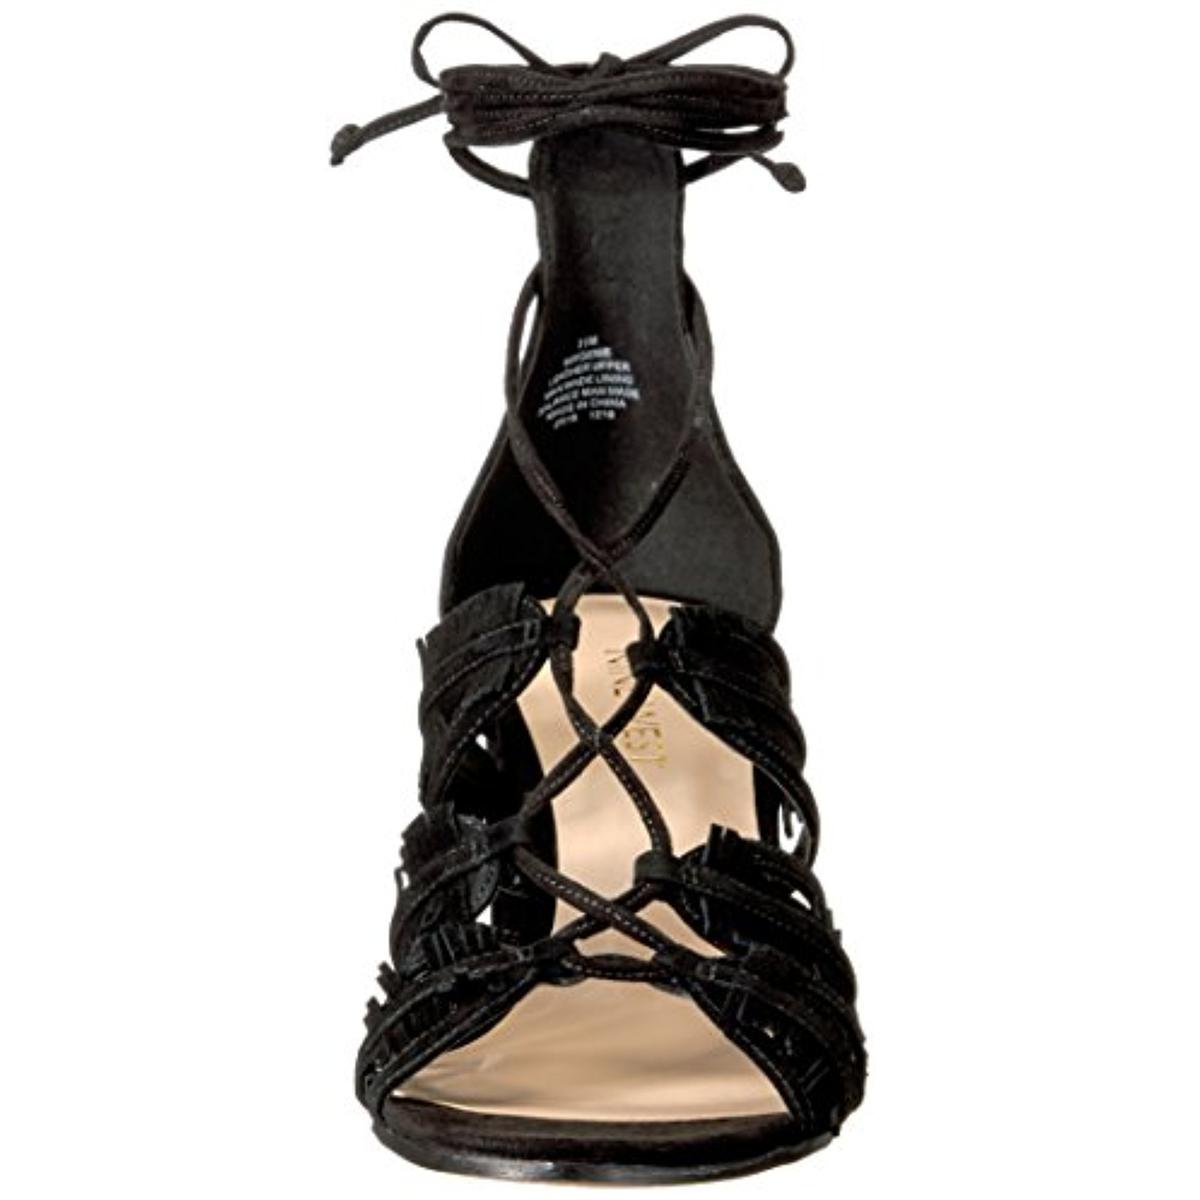 Nine-West-Womens-Genie-Suede-Open-Toe-Heels-Dress-Sandals-Shoes-BHFO-3210 thumbnail 9